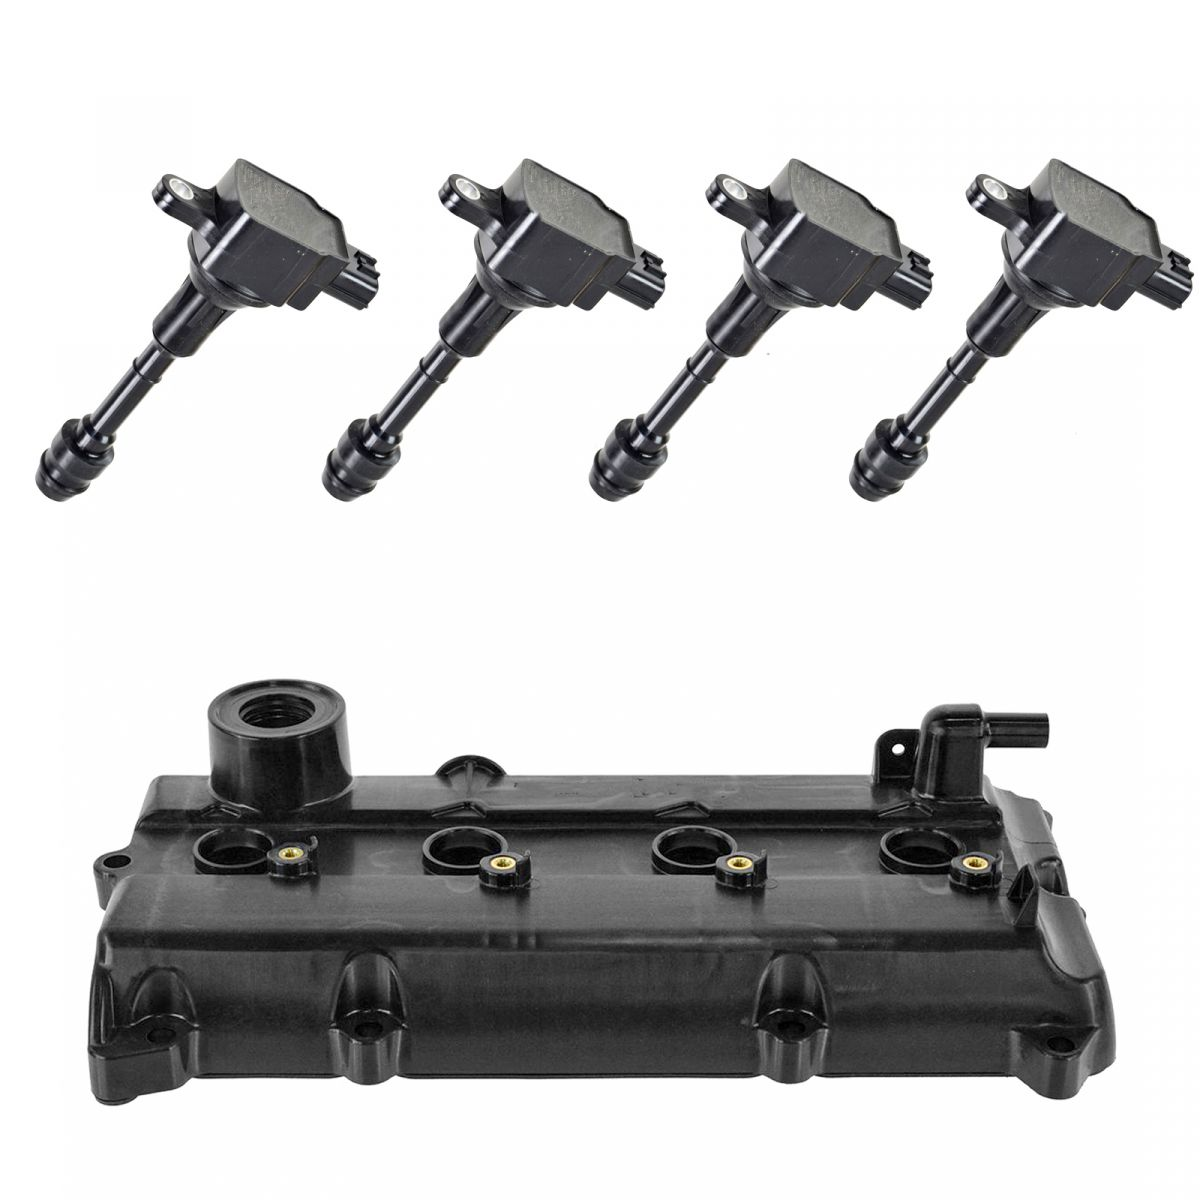 Engine-Valve-Cover-Gaskets-amp-Ignition-Coil-Kit-Set-for-Nissan-Altima-Sentra-New